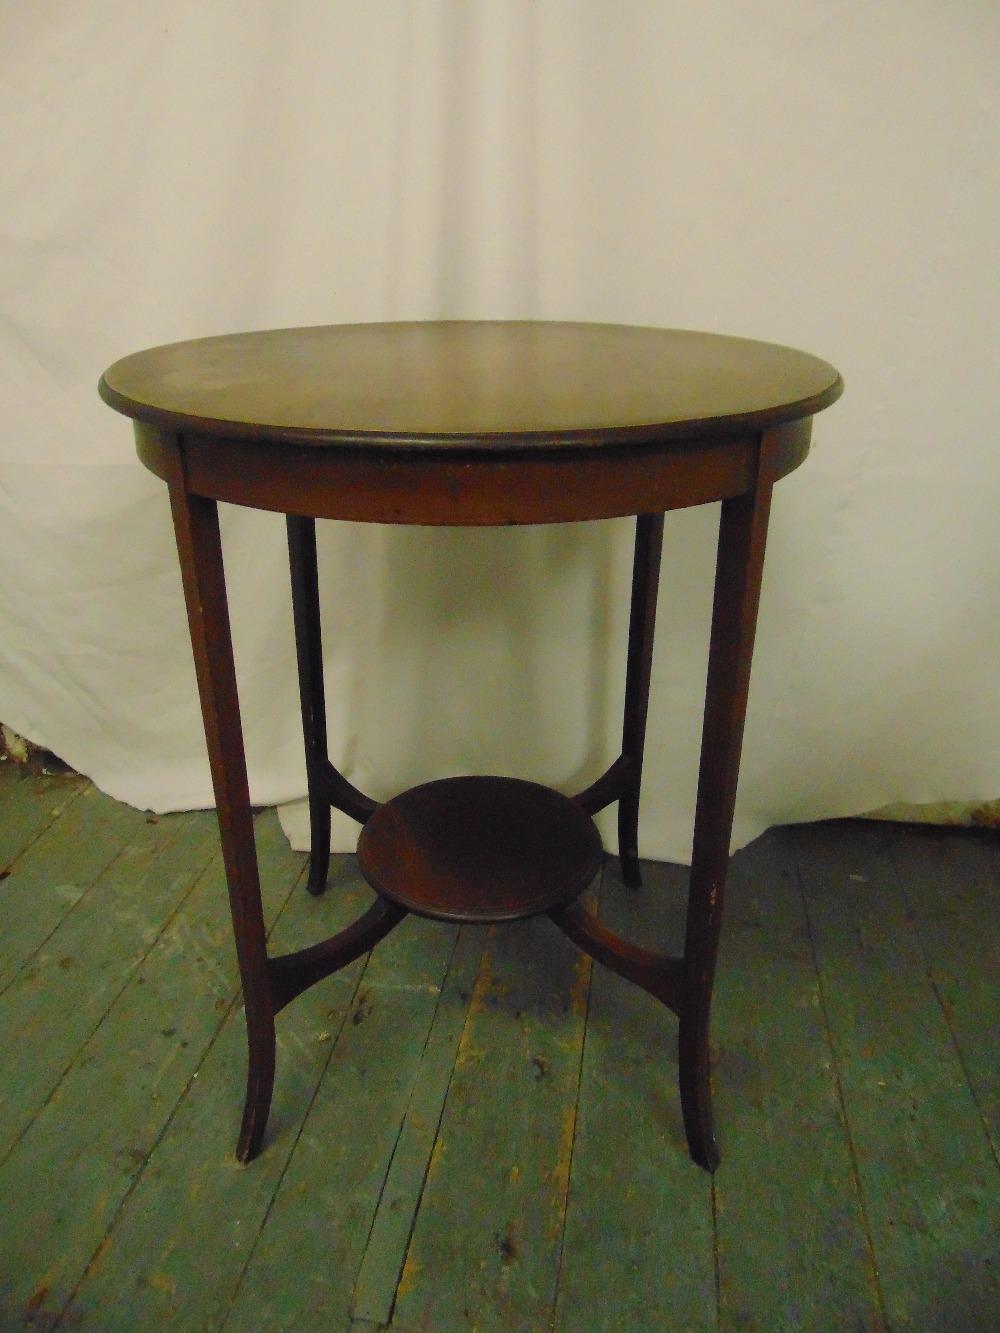 Lot 30 - An Edwardian mahogany circular occasional table on tapering rectangular legs